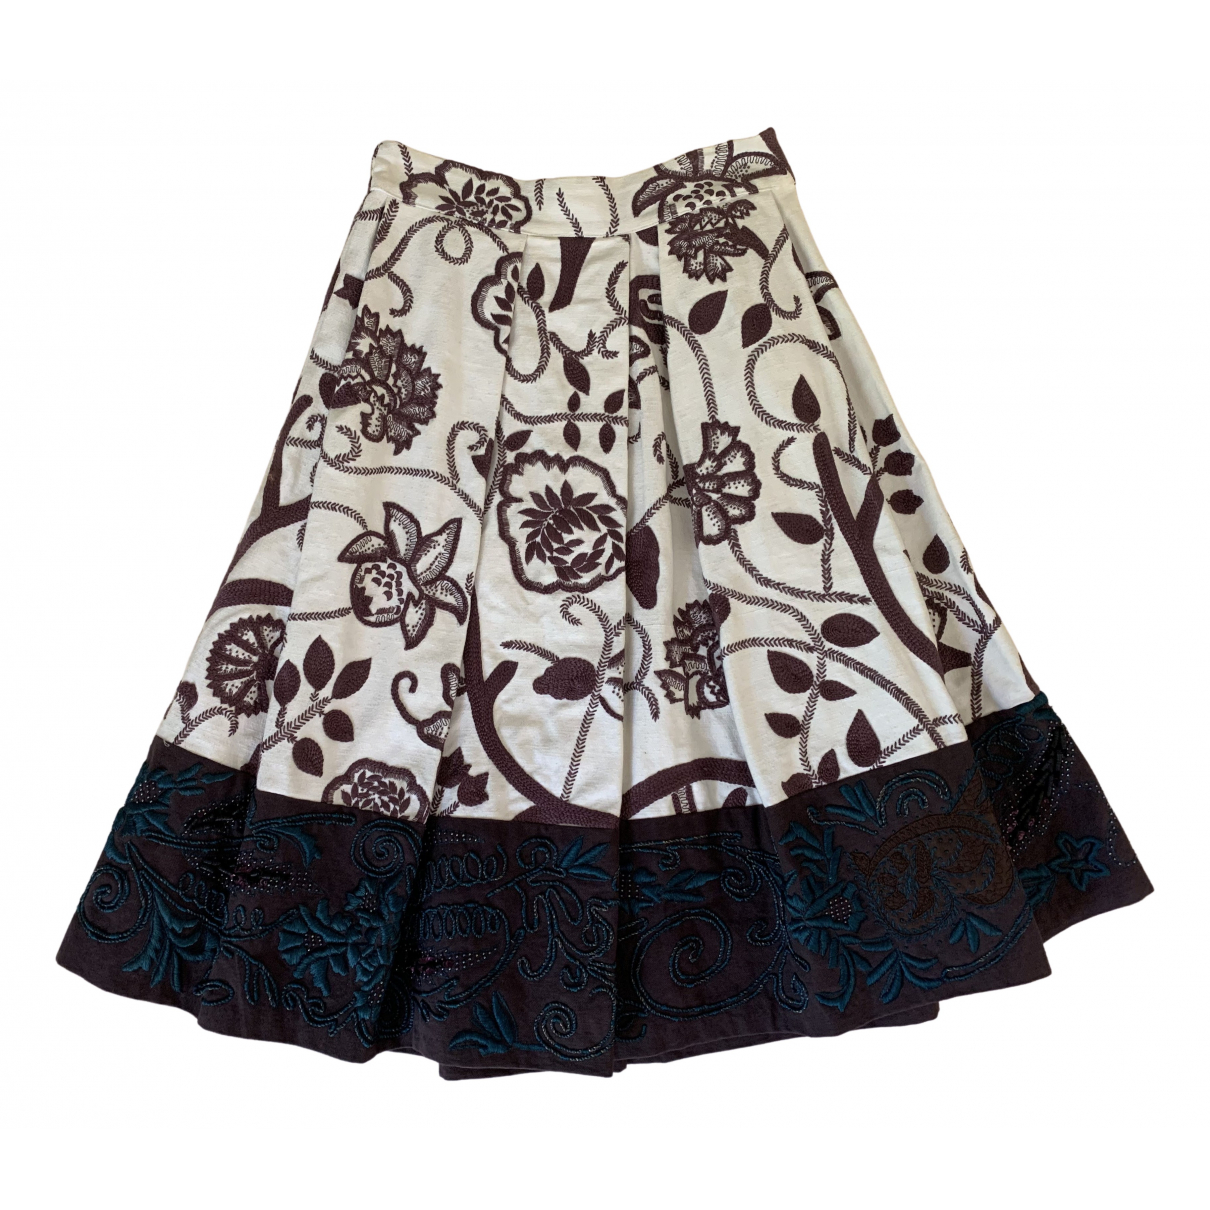 Dries Van Noten \N Multicolour Cotton skirt for Women 36 FR